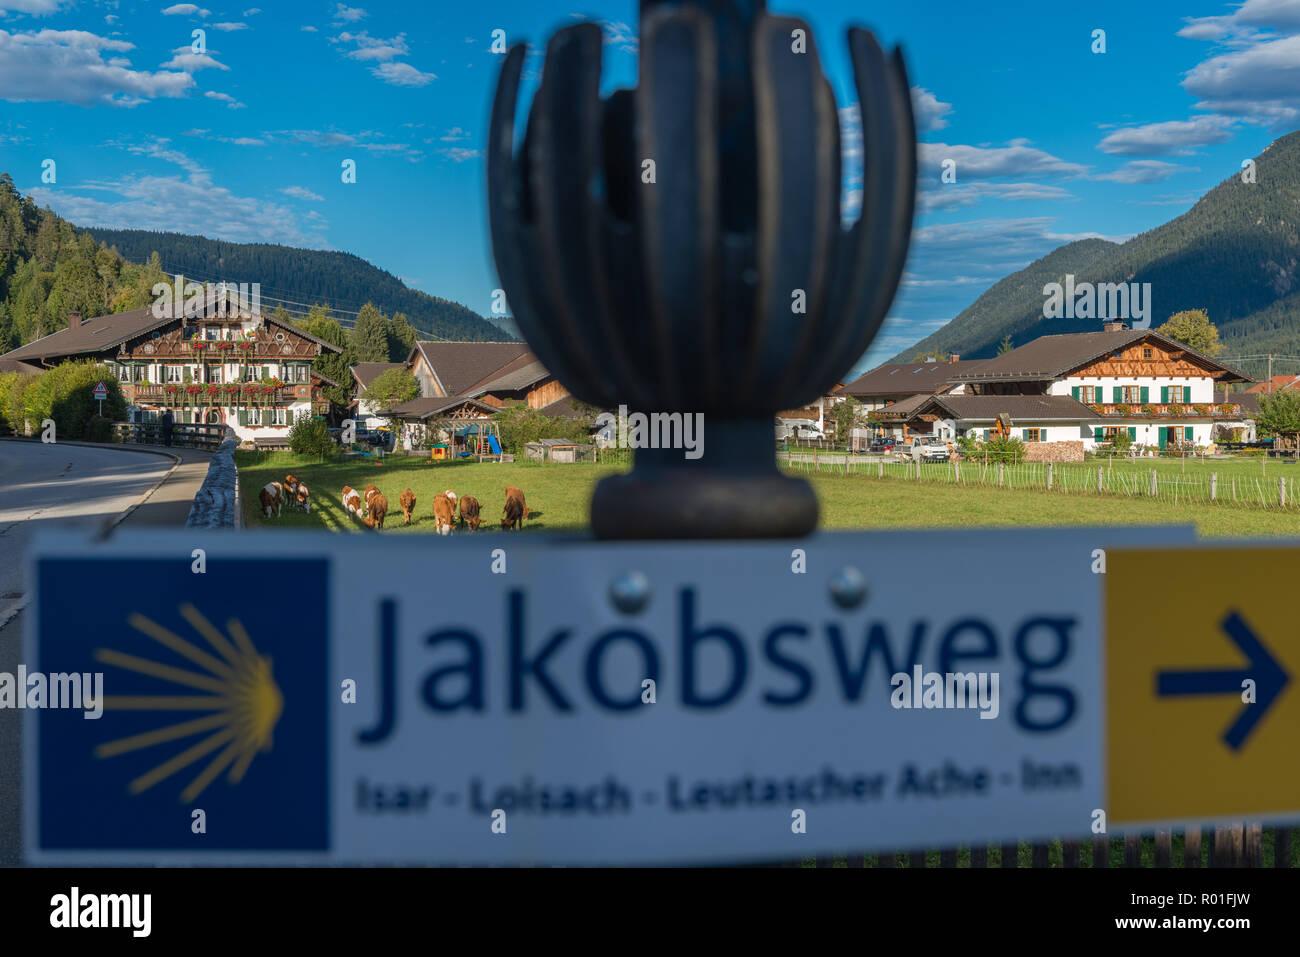 Jakobsweg, pilgrim´s way or Road to Santiago, Wallgau, Bavaria, Germany, - Stock Image